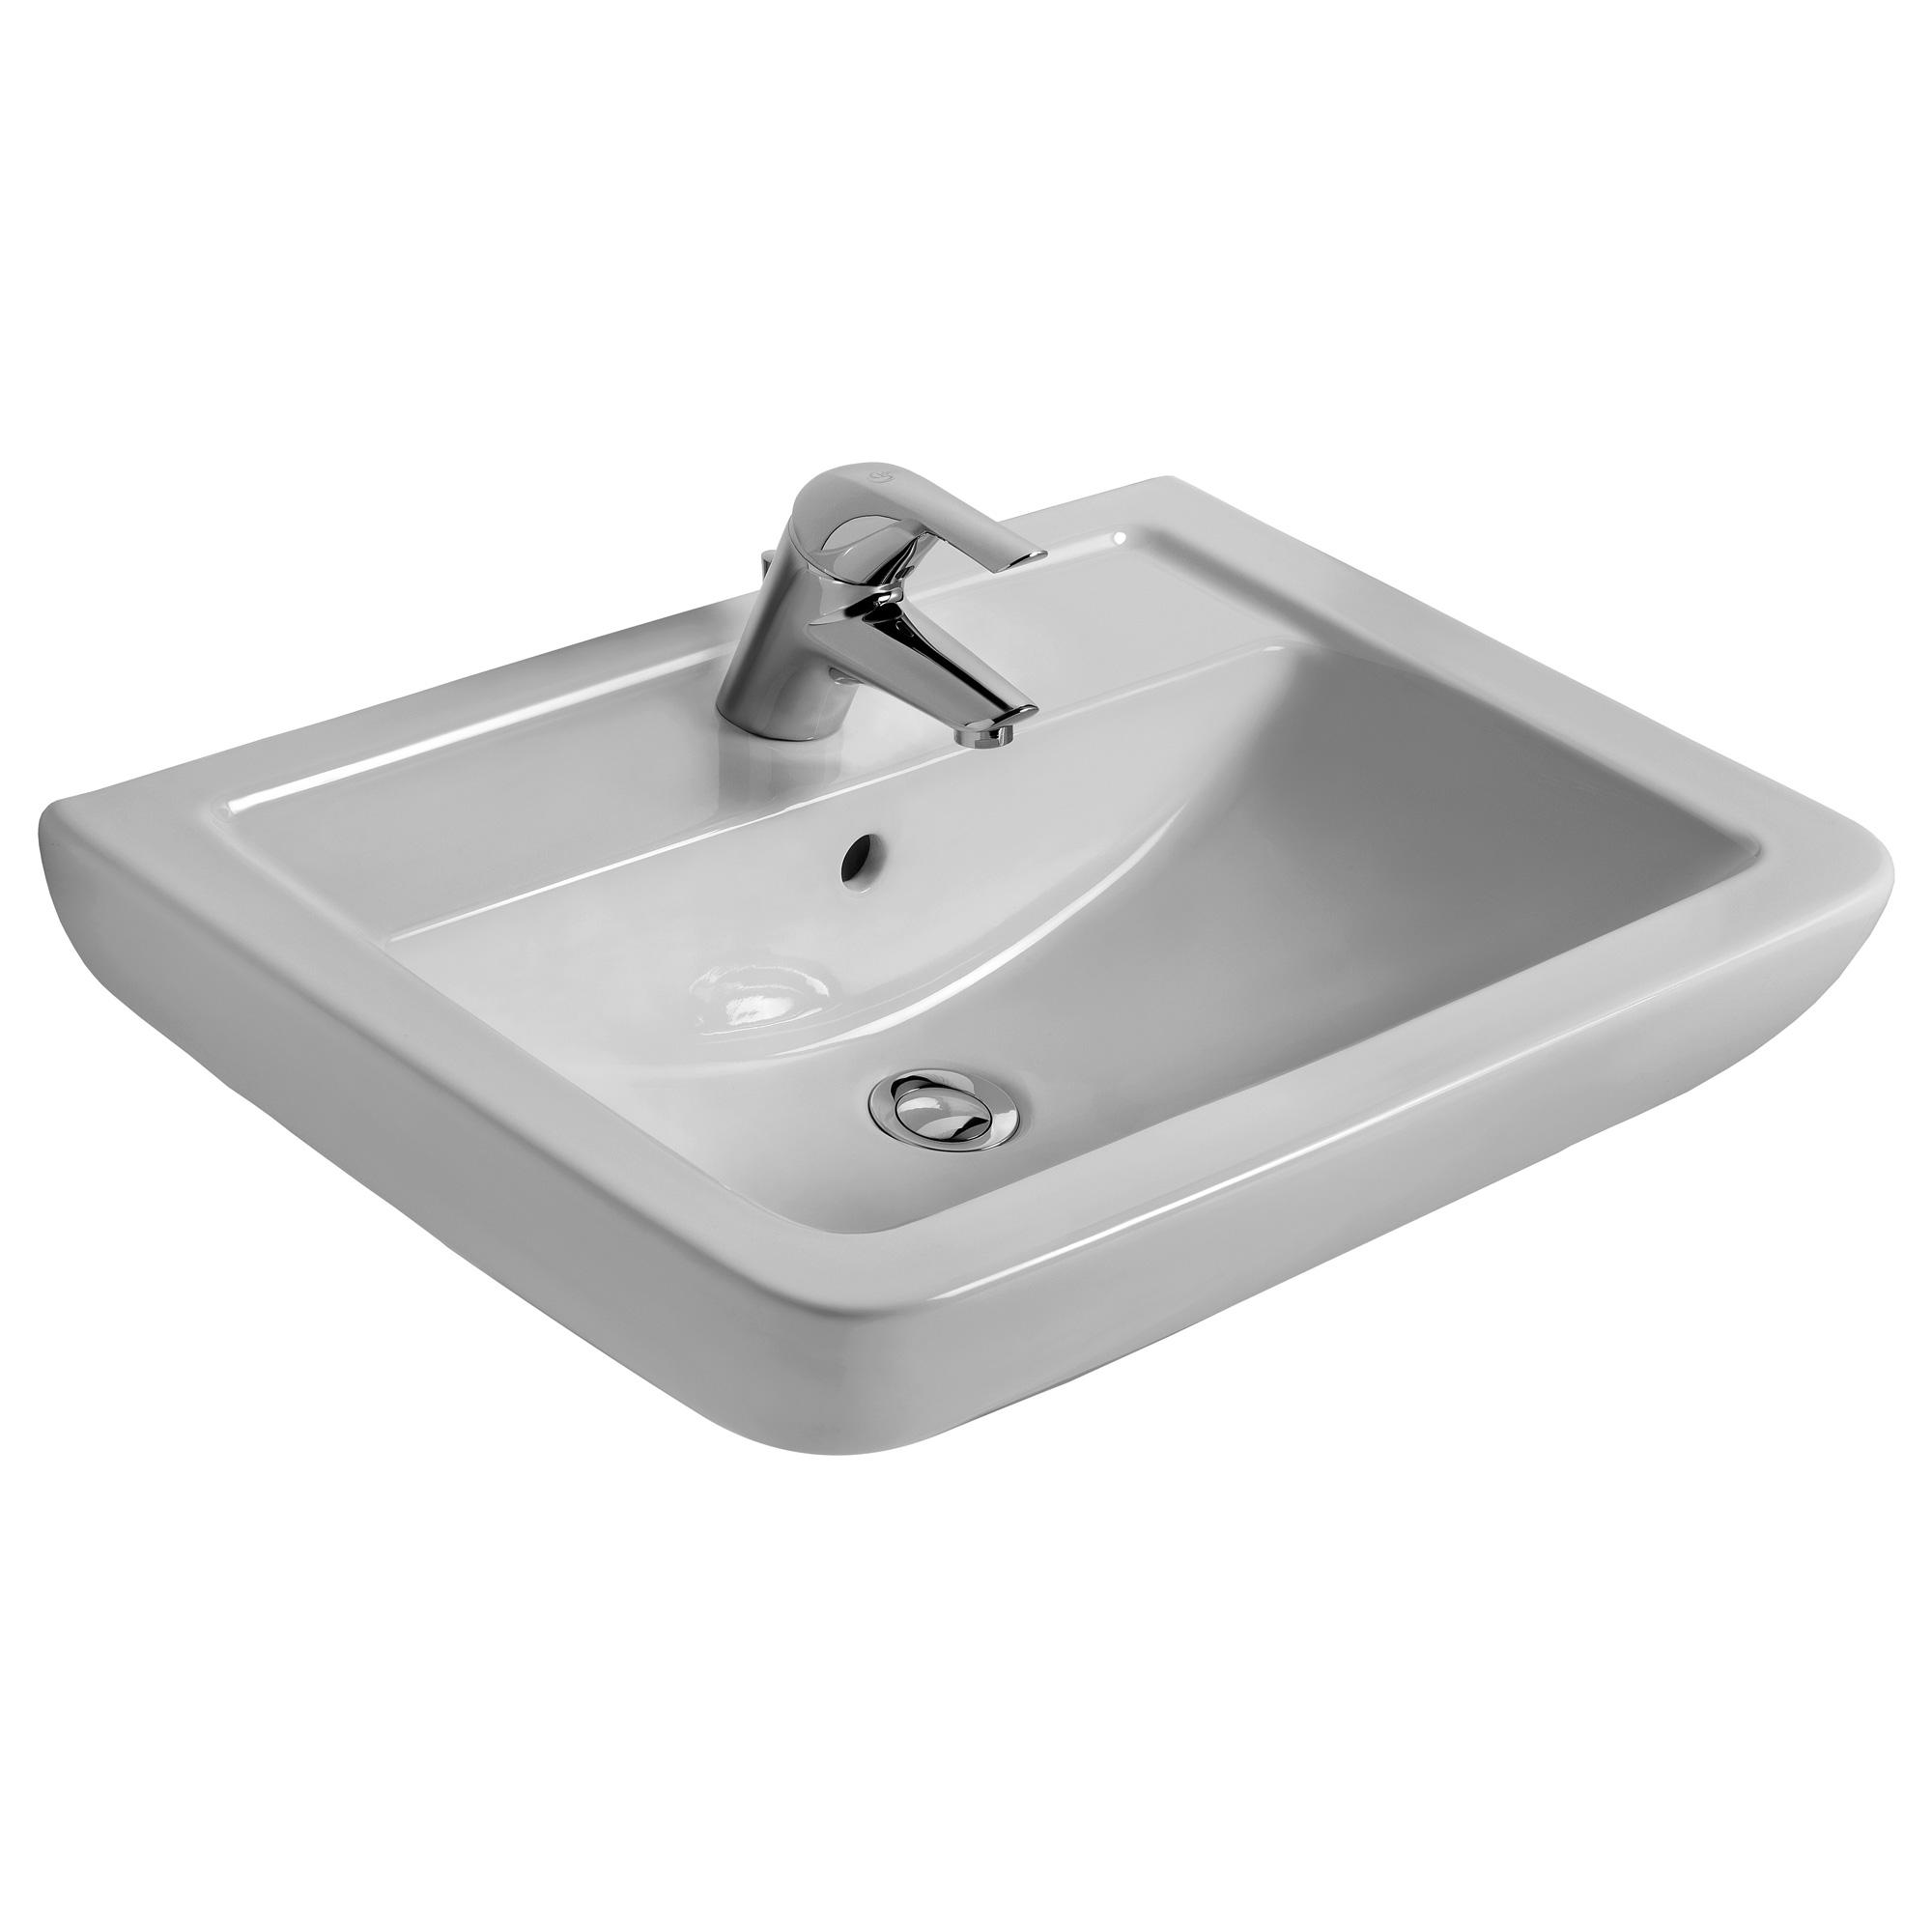 ideal standard eurovit waschtisch v302701 reuter. Black Bedroom Furniture Sets. Home Design Ideas